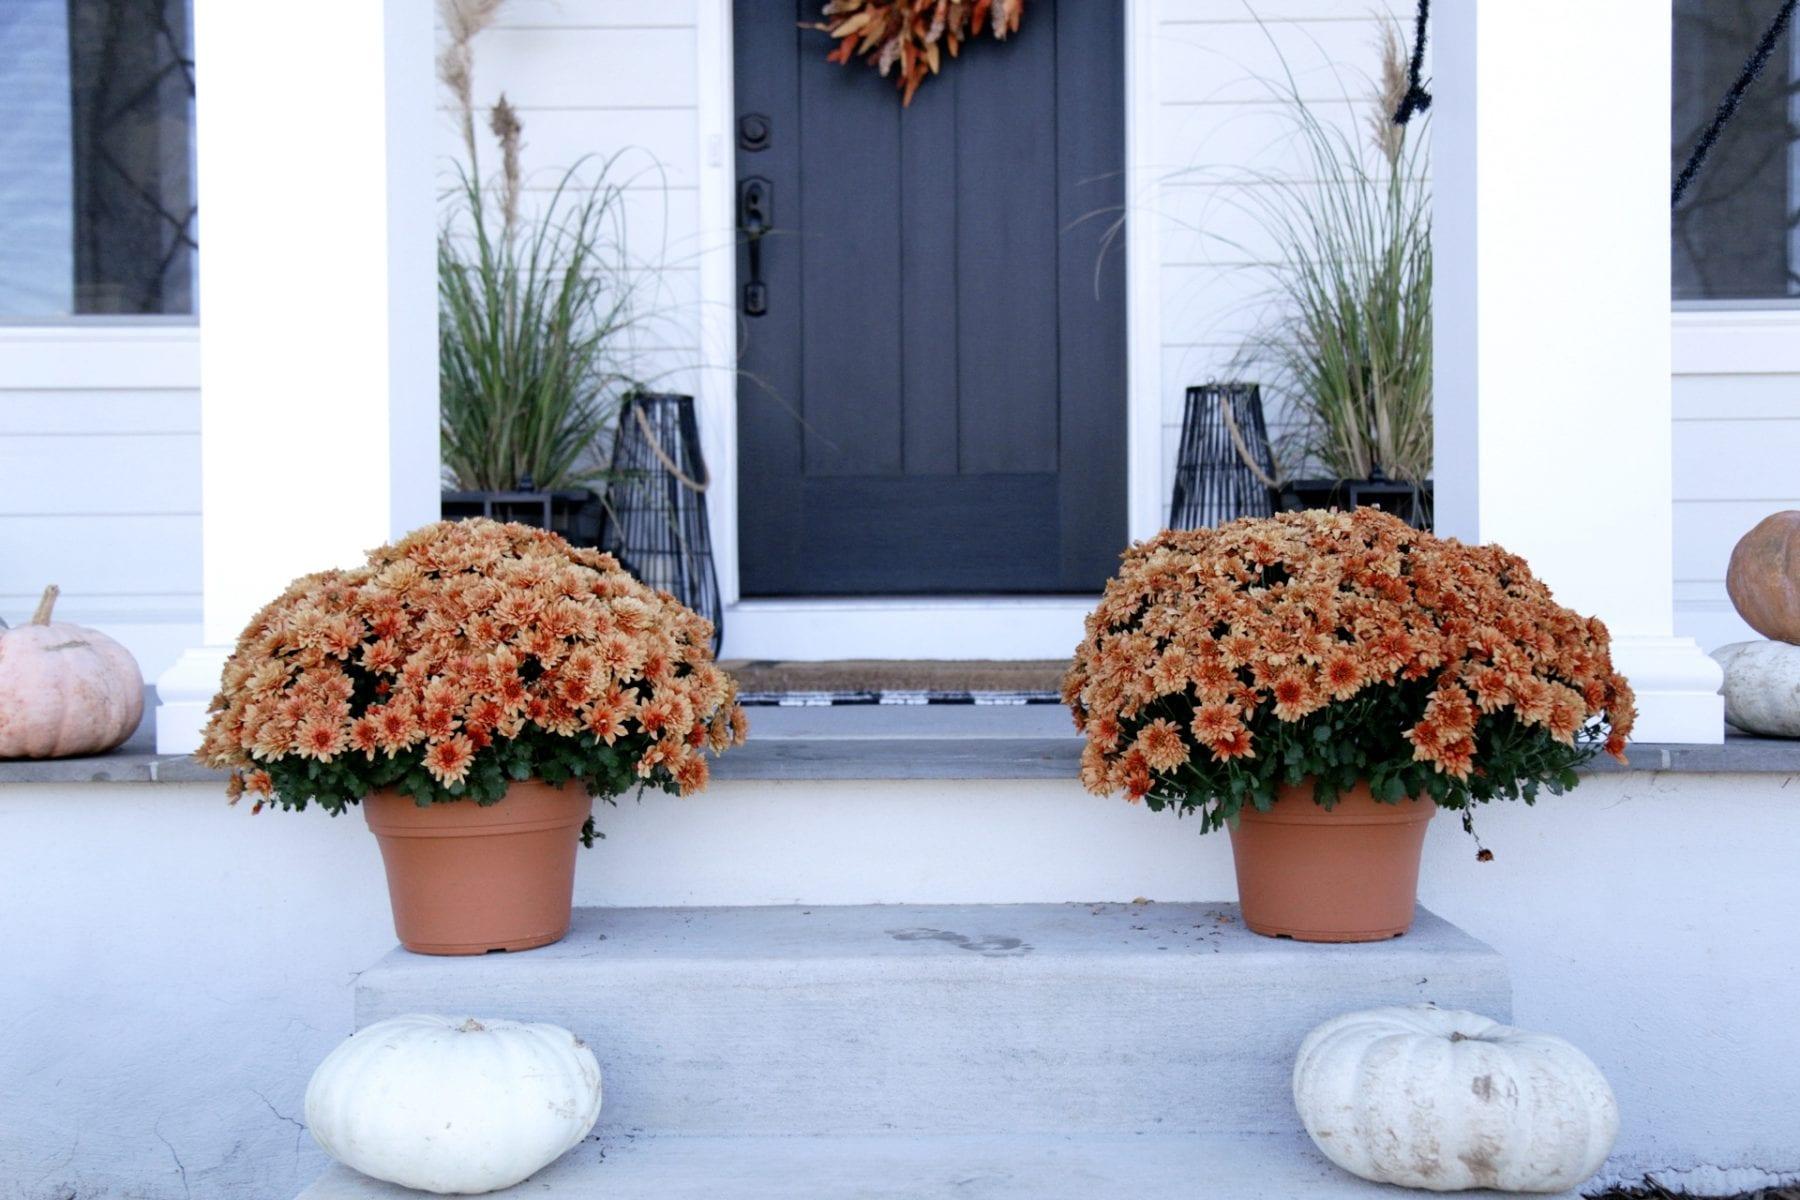 Halloween porch decorations Leanne Barlow